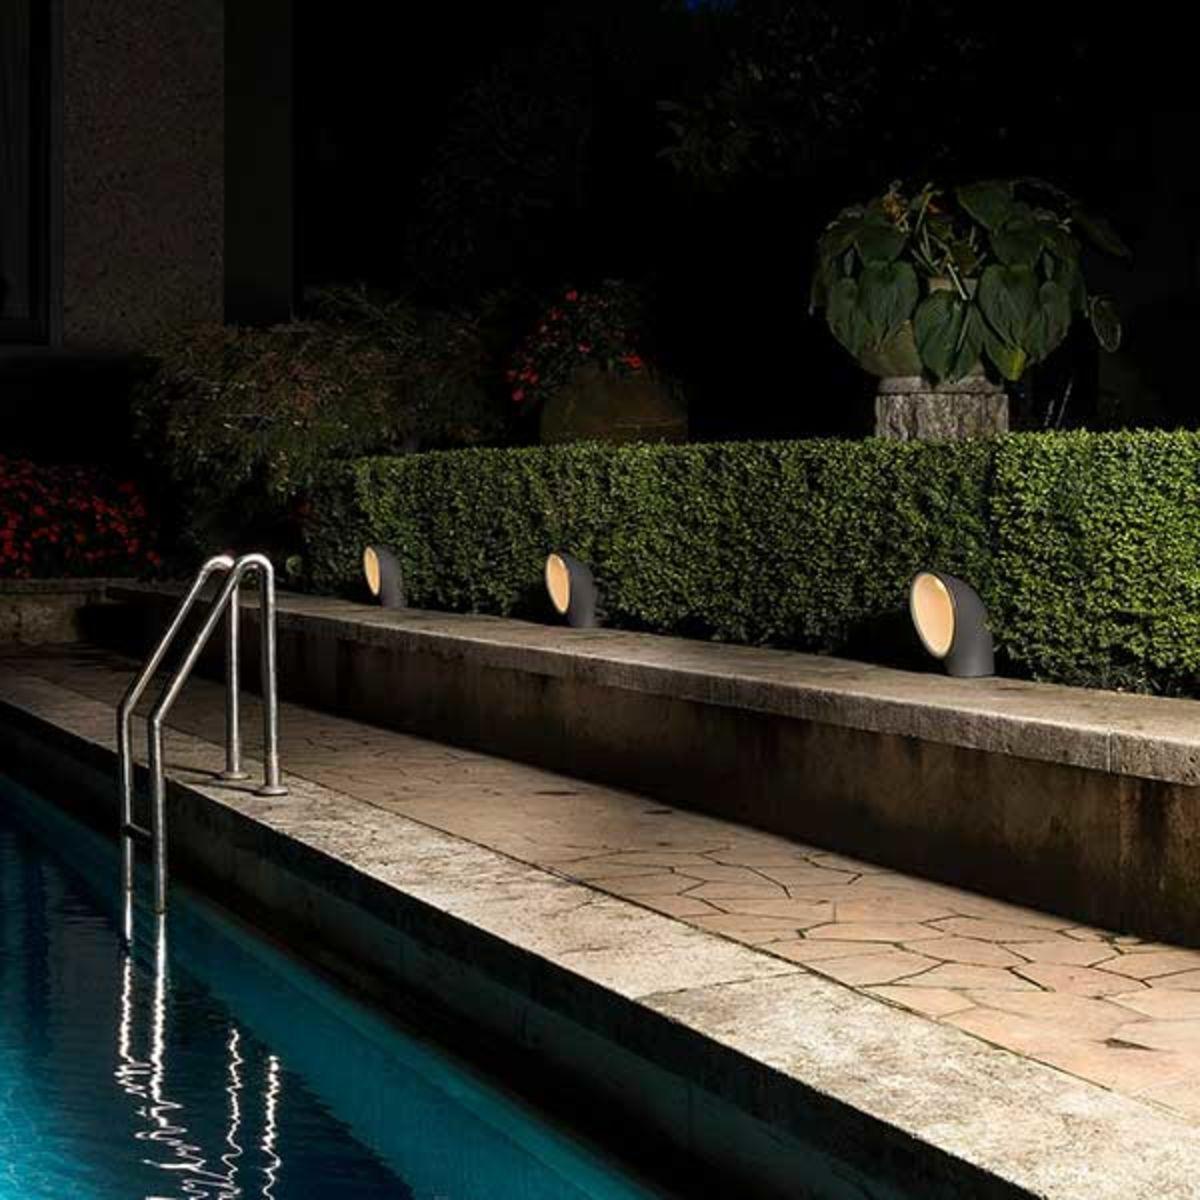 Lampada da terra per outdoor Piroscafo by Artemide